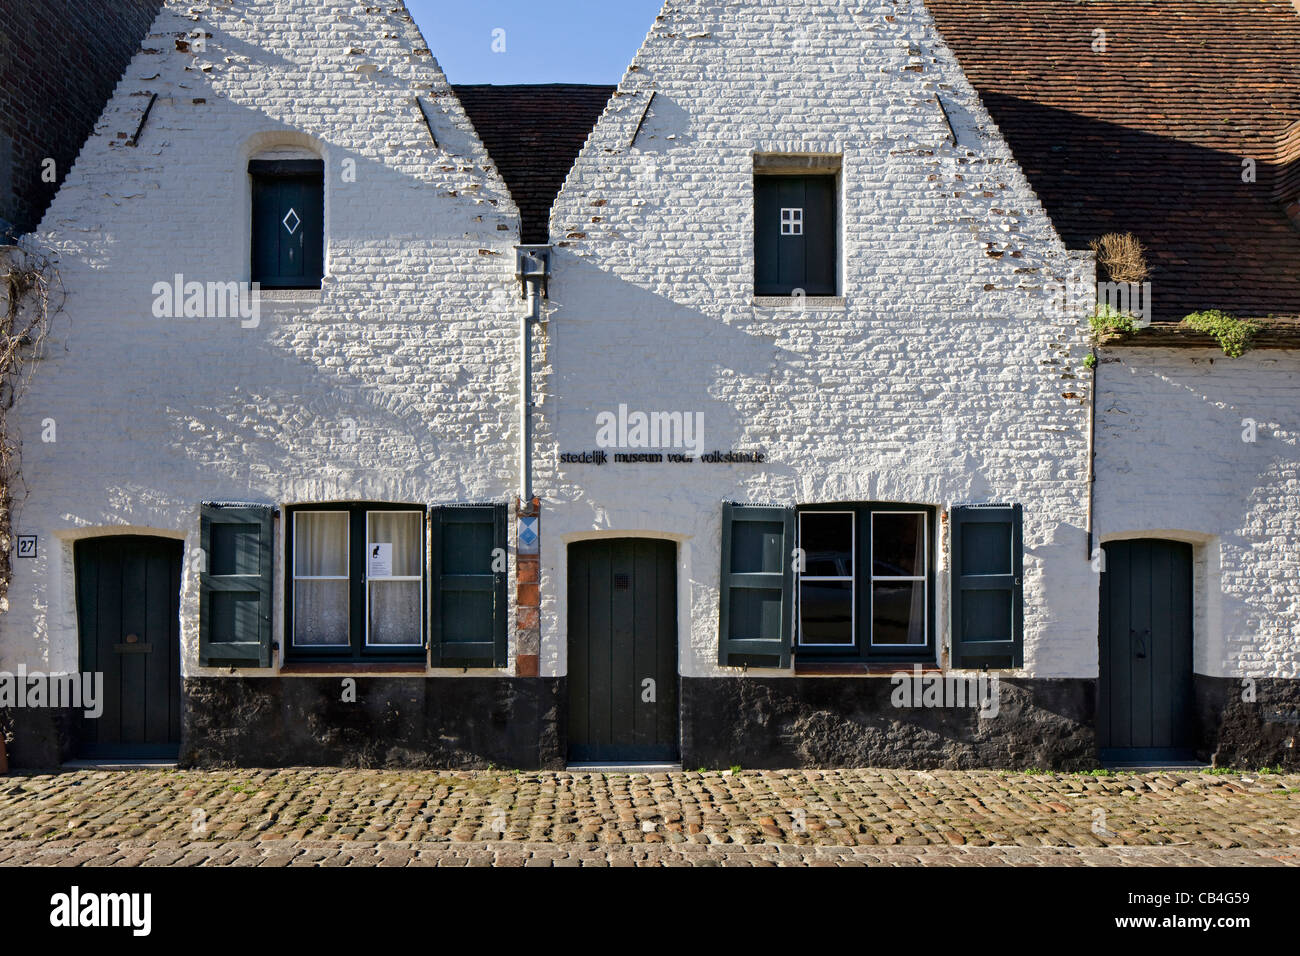 The museum of folklore and Black Cat / Zwarte Kat in Bruges, Belgium - Stock Image